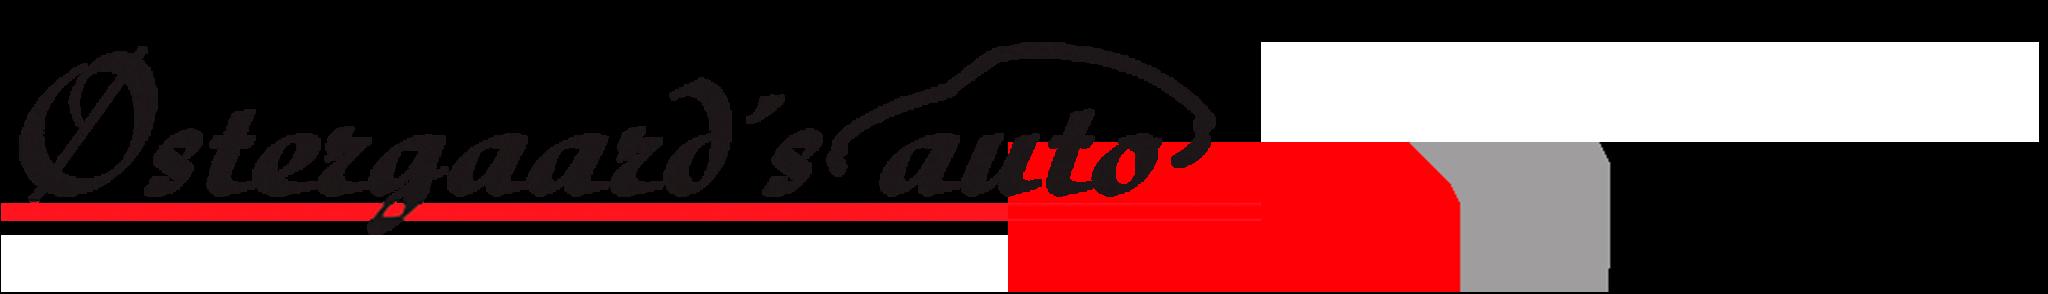 Østergaards Auto